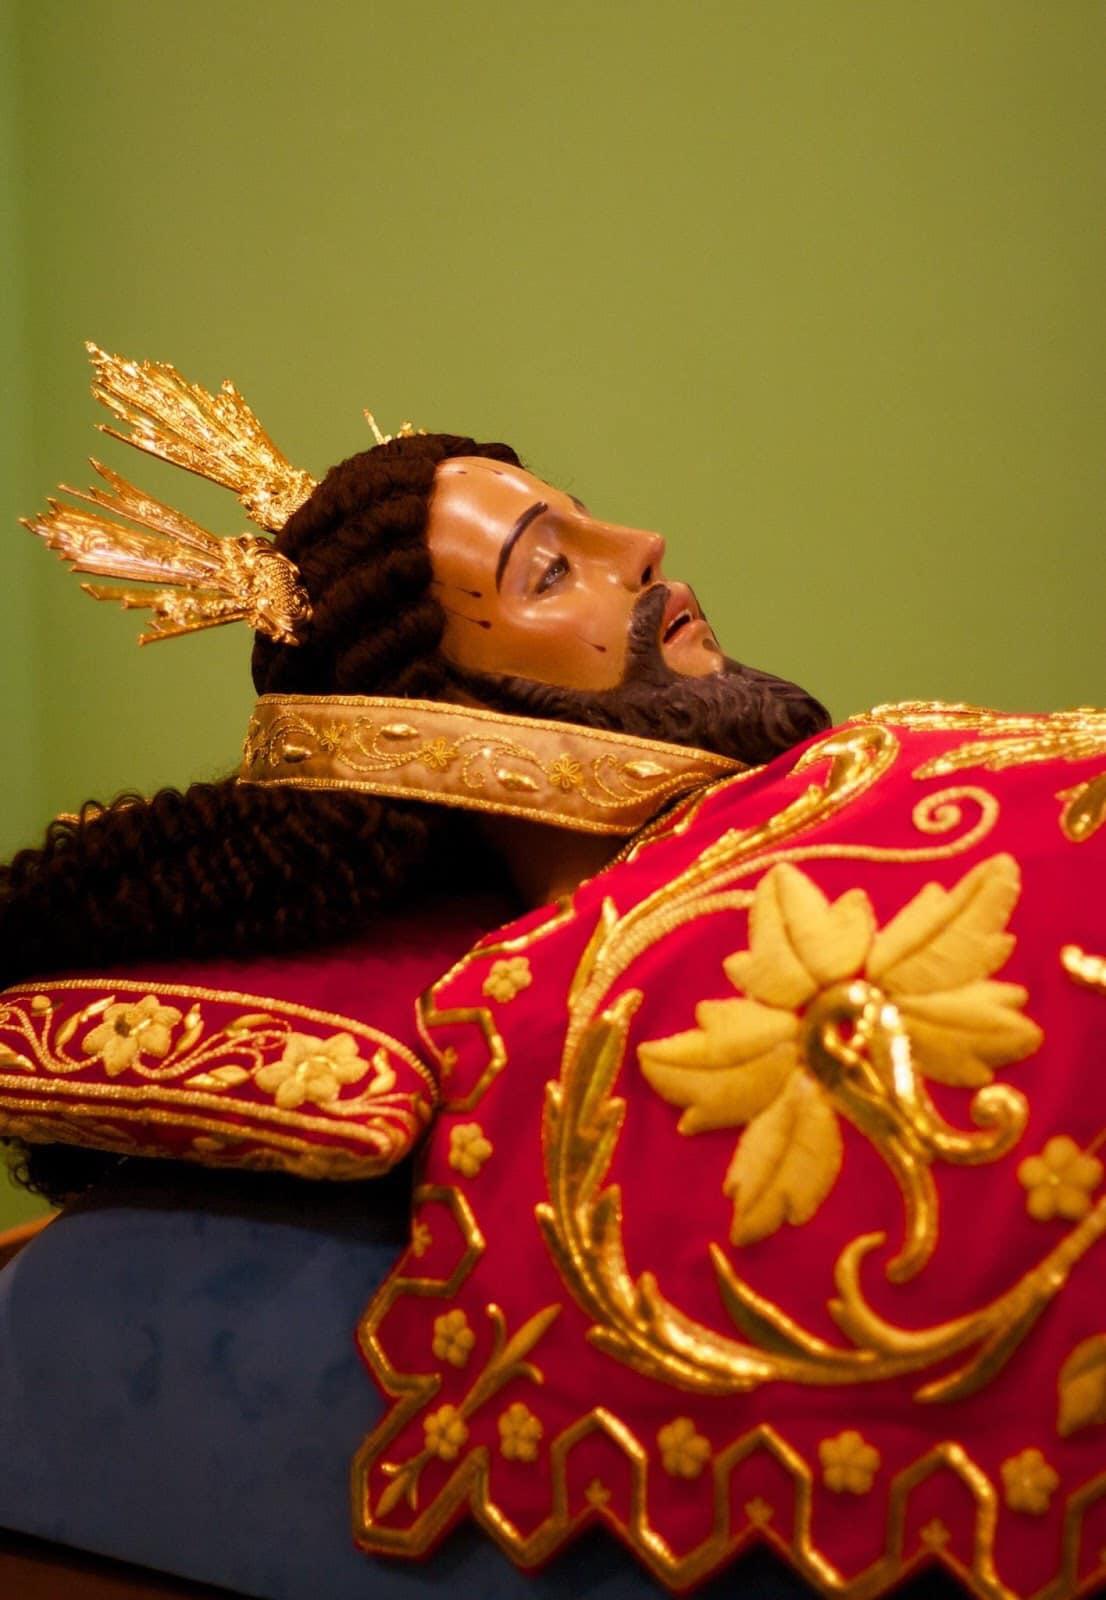 The restored post-war Señor Santo Sepulcro of Paco